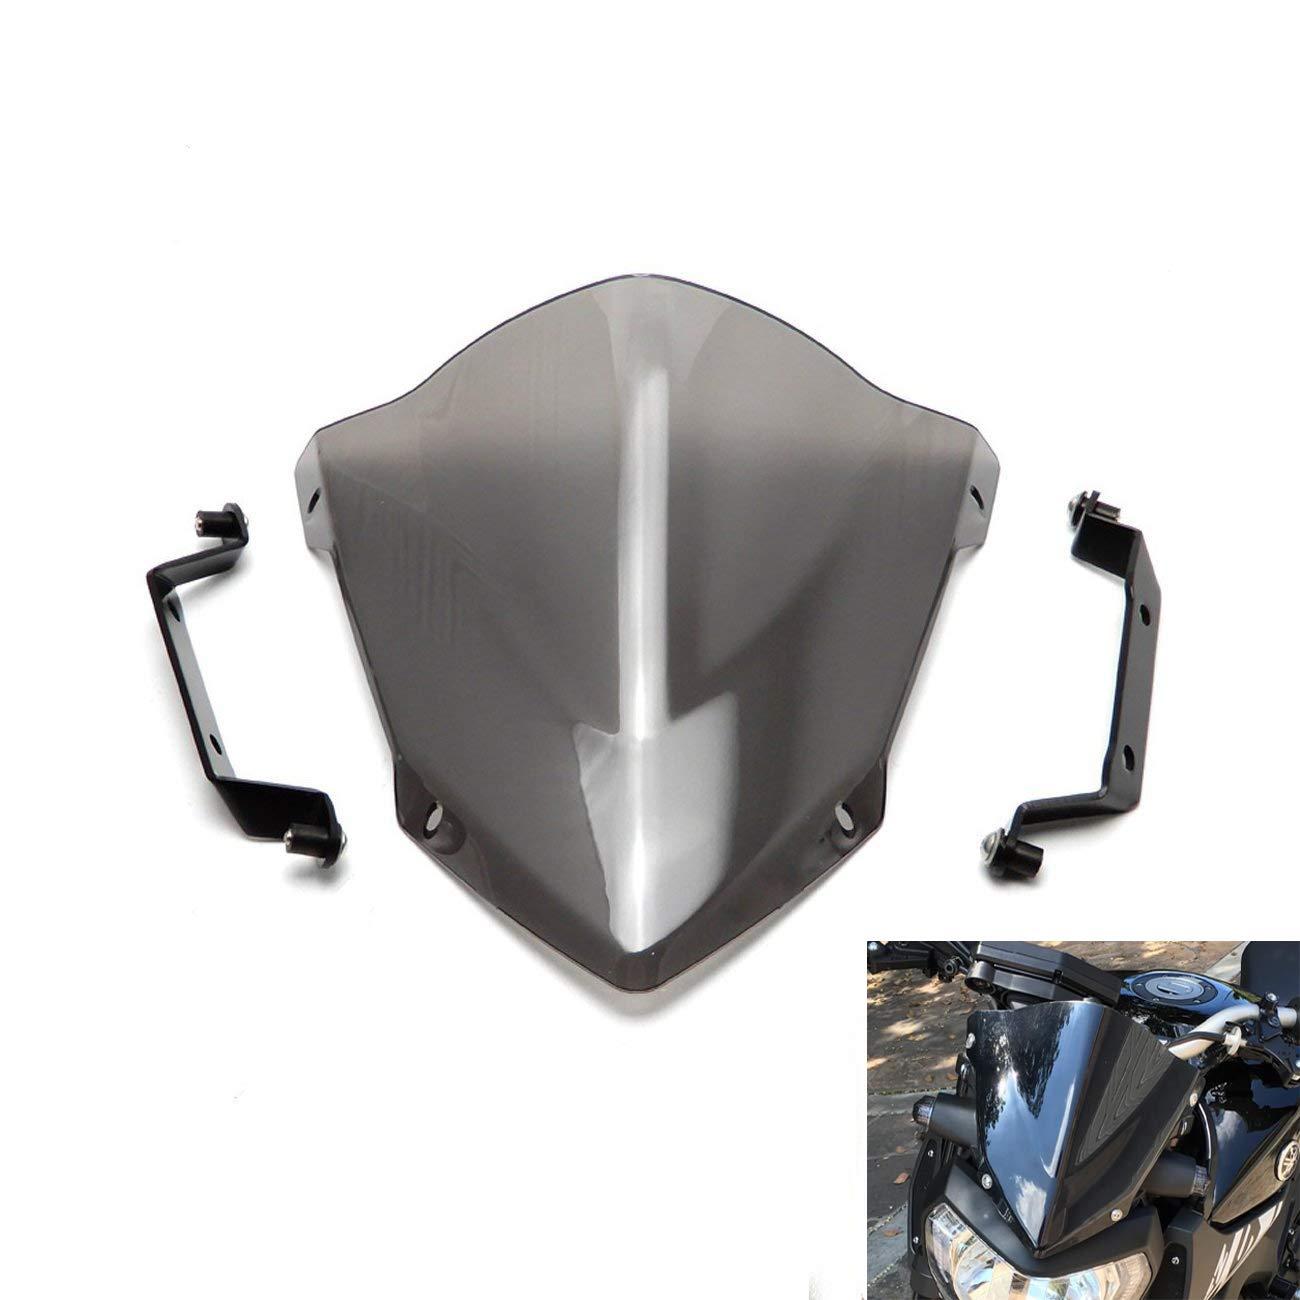 KEMIMOTO FZ 09 Windshield WindScreen + Bolts Screws Bracket For Yamaha FZ-09 FZ09 2014-2016 VicsaWin